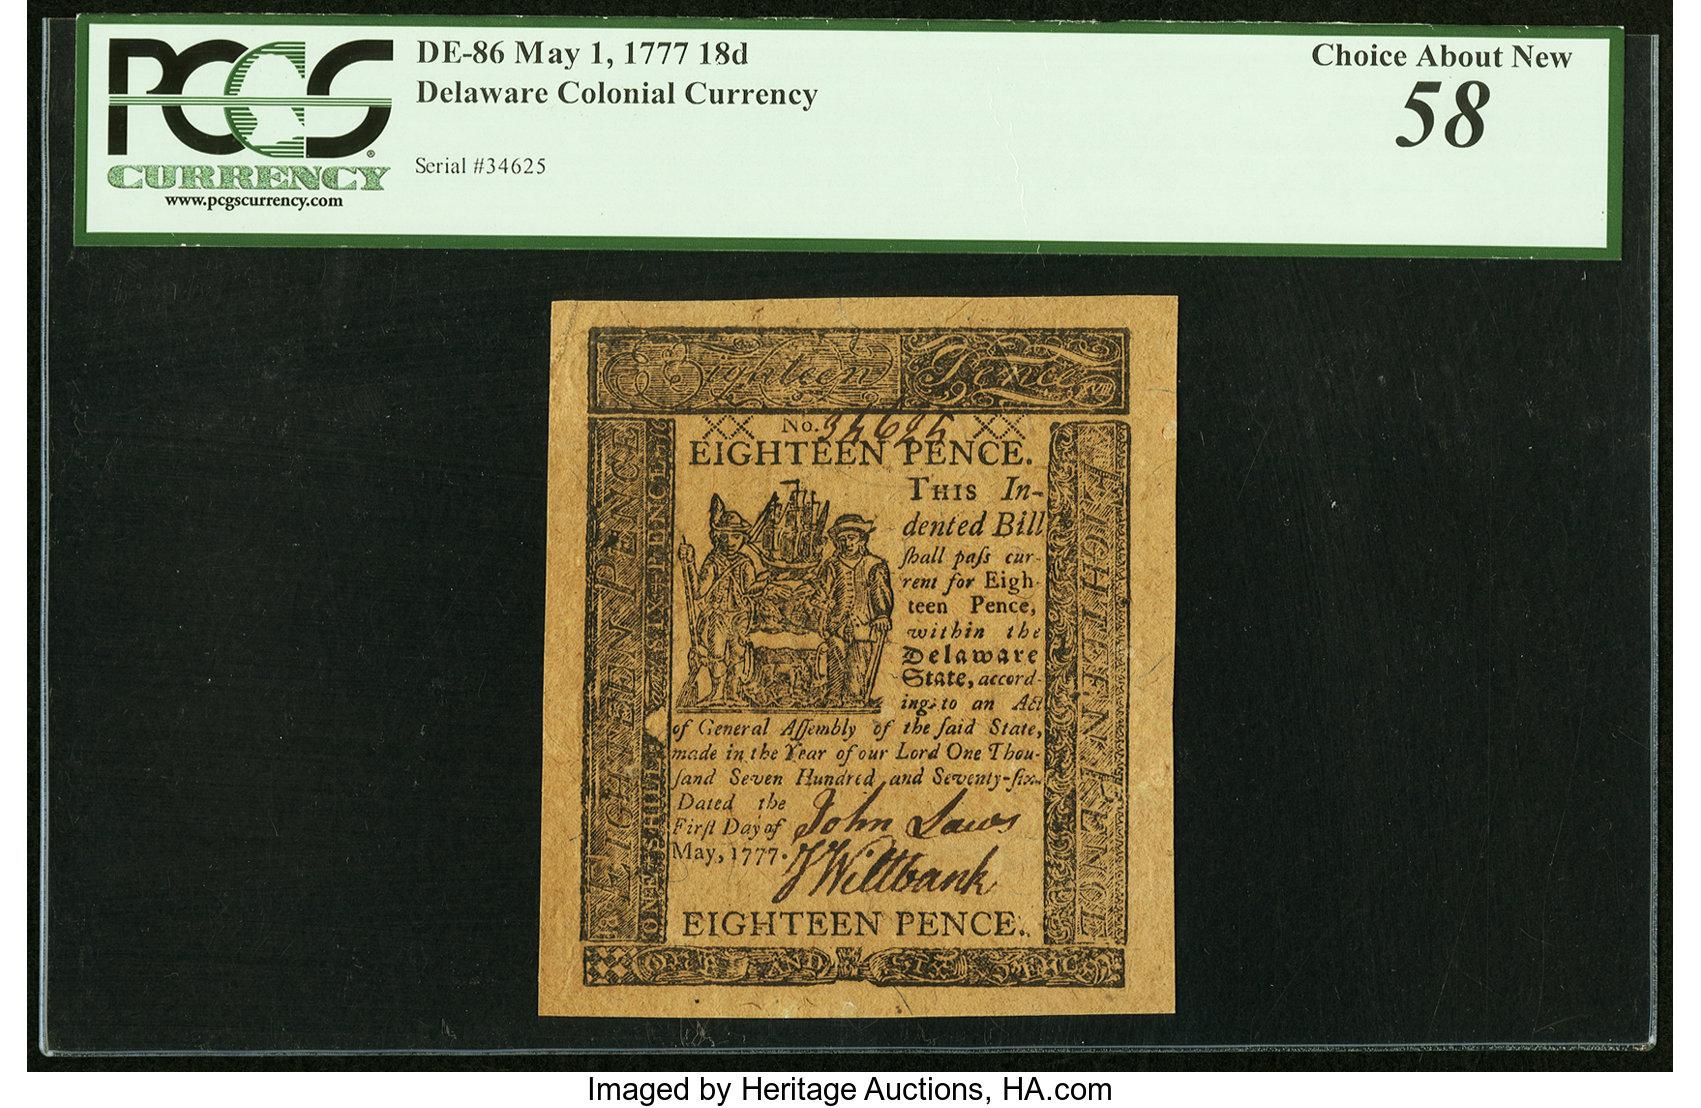 sample image for 1777 1-May 18d (Fr.# DE86)